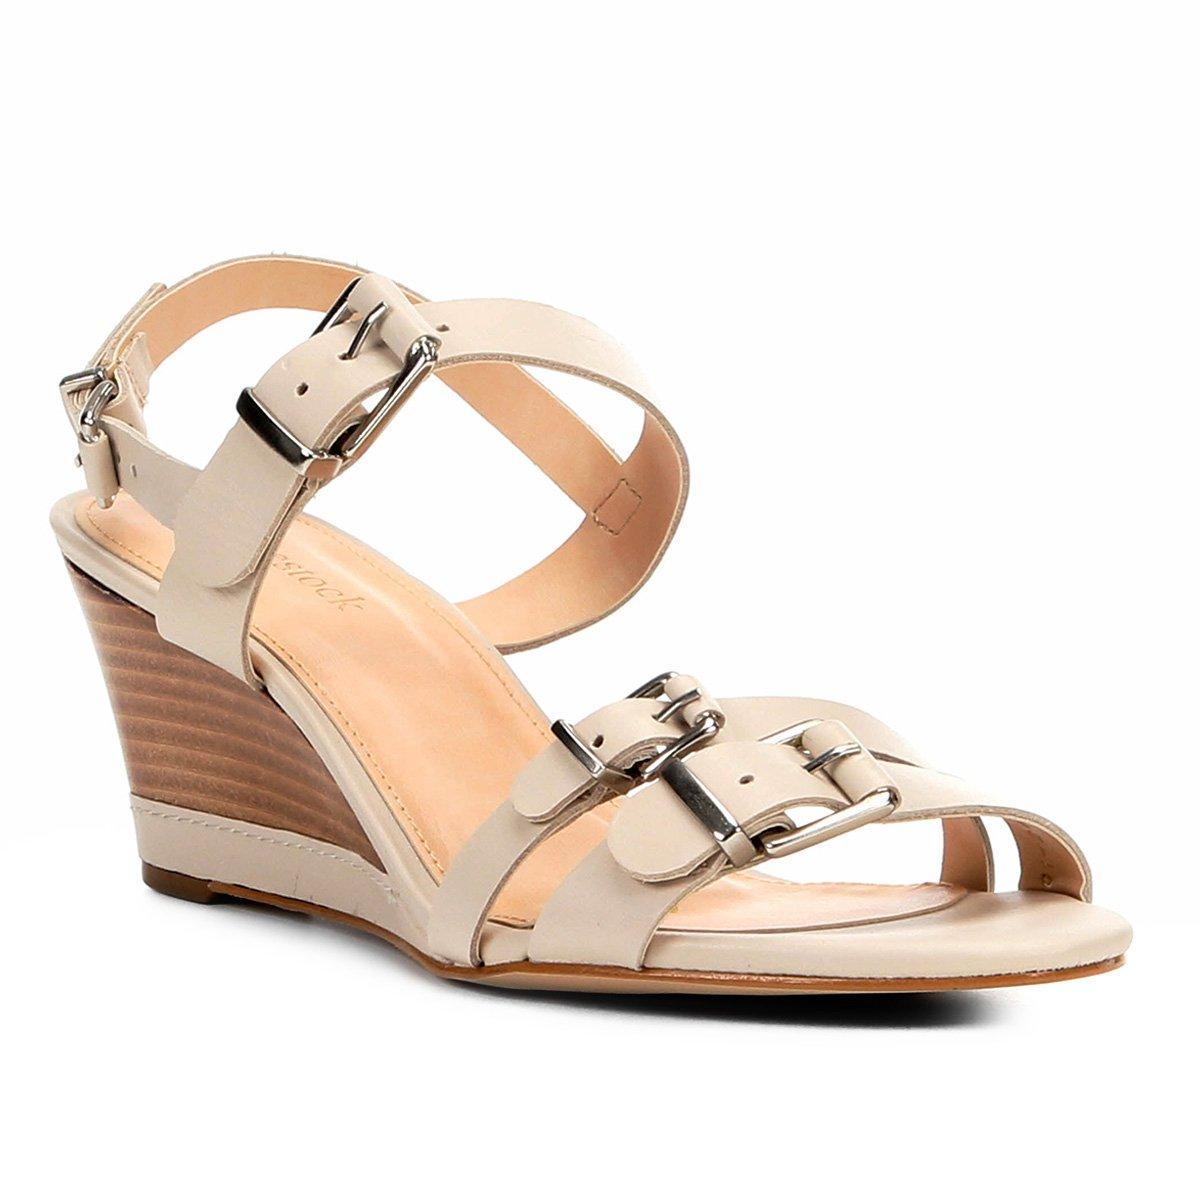 8f1ee03006 Sandália Anabela Couro Shoestock Fivelas Feminina